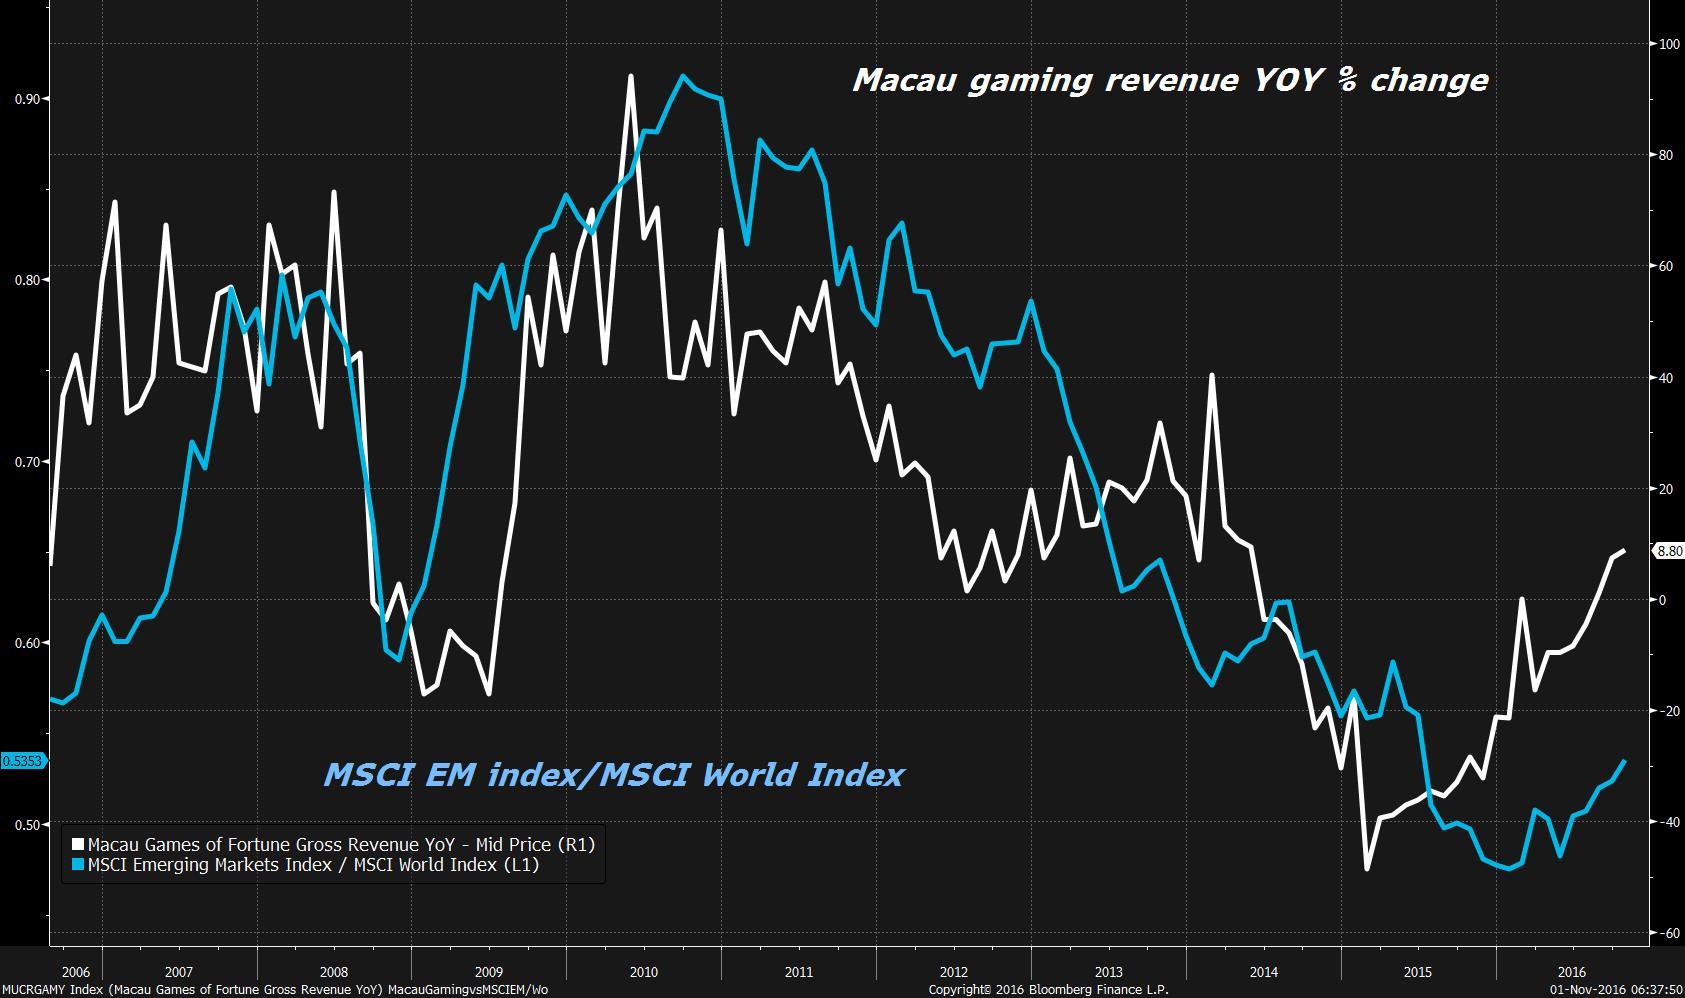 RT @TheStalwart: Macau gaming revenue…